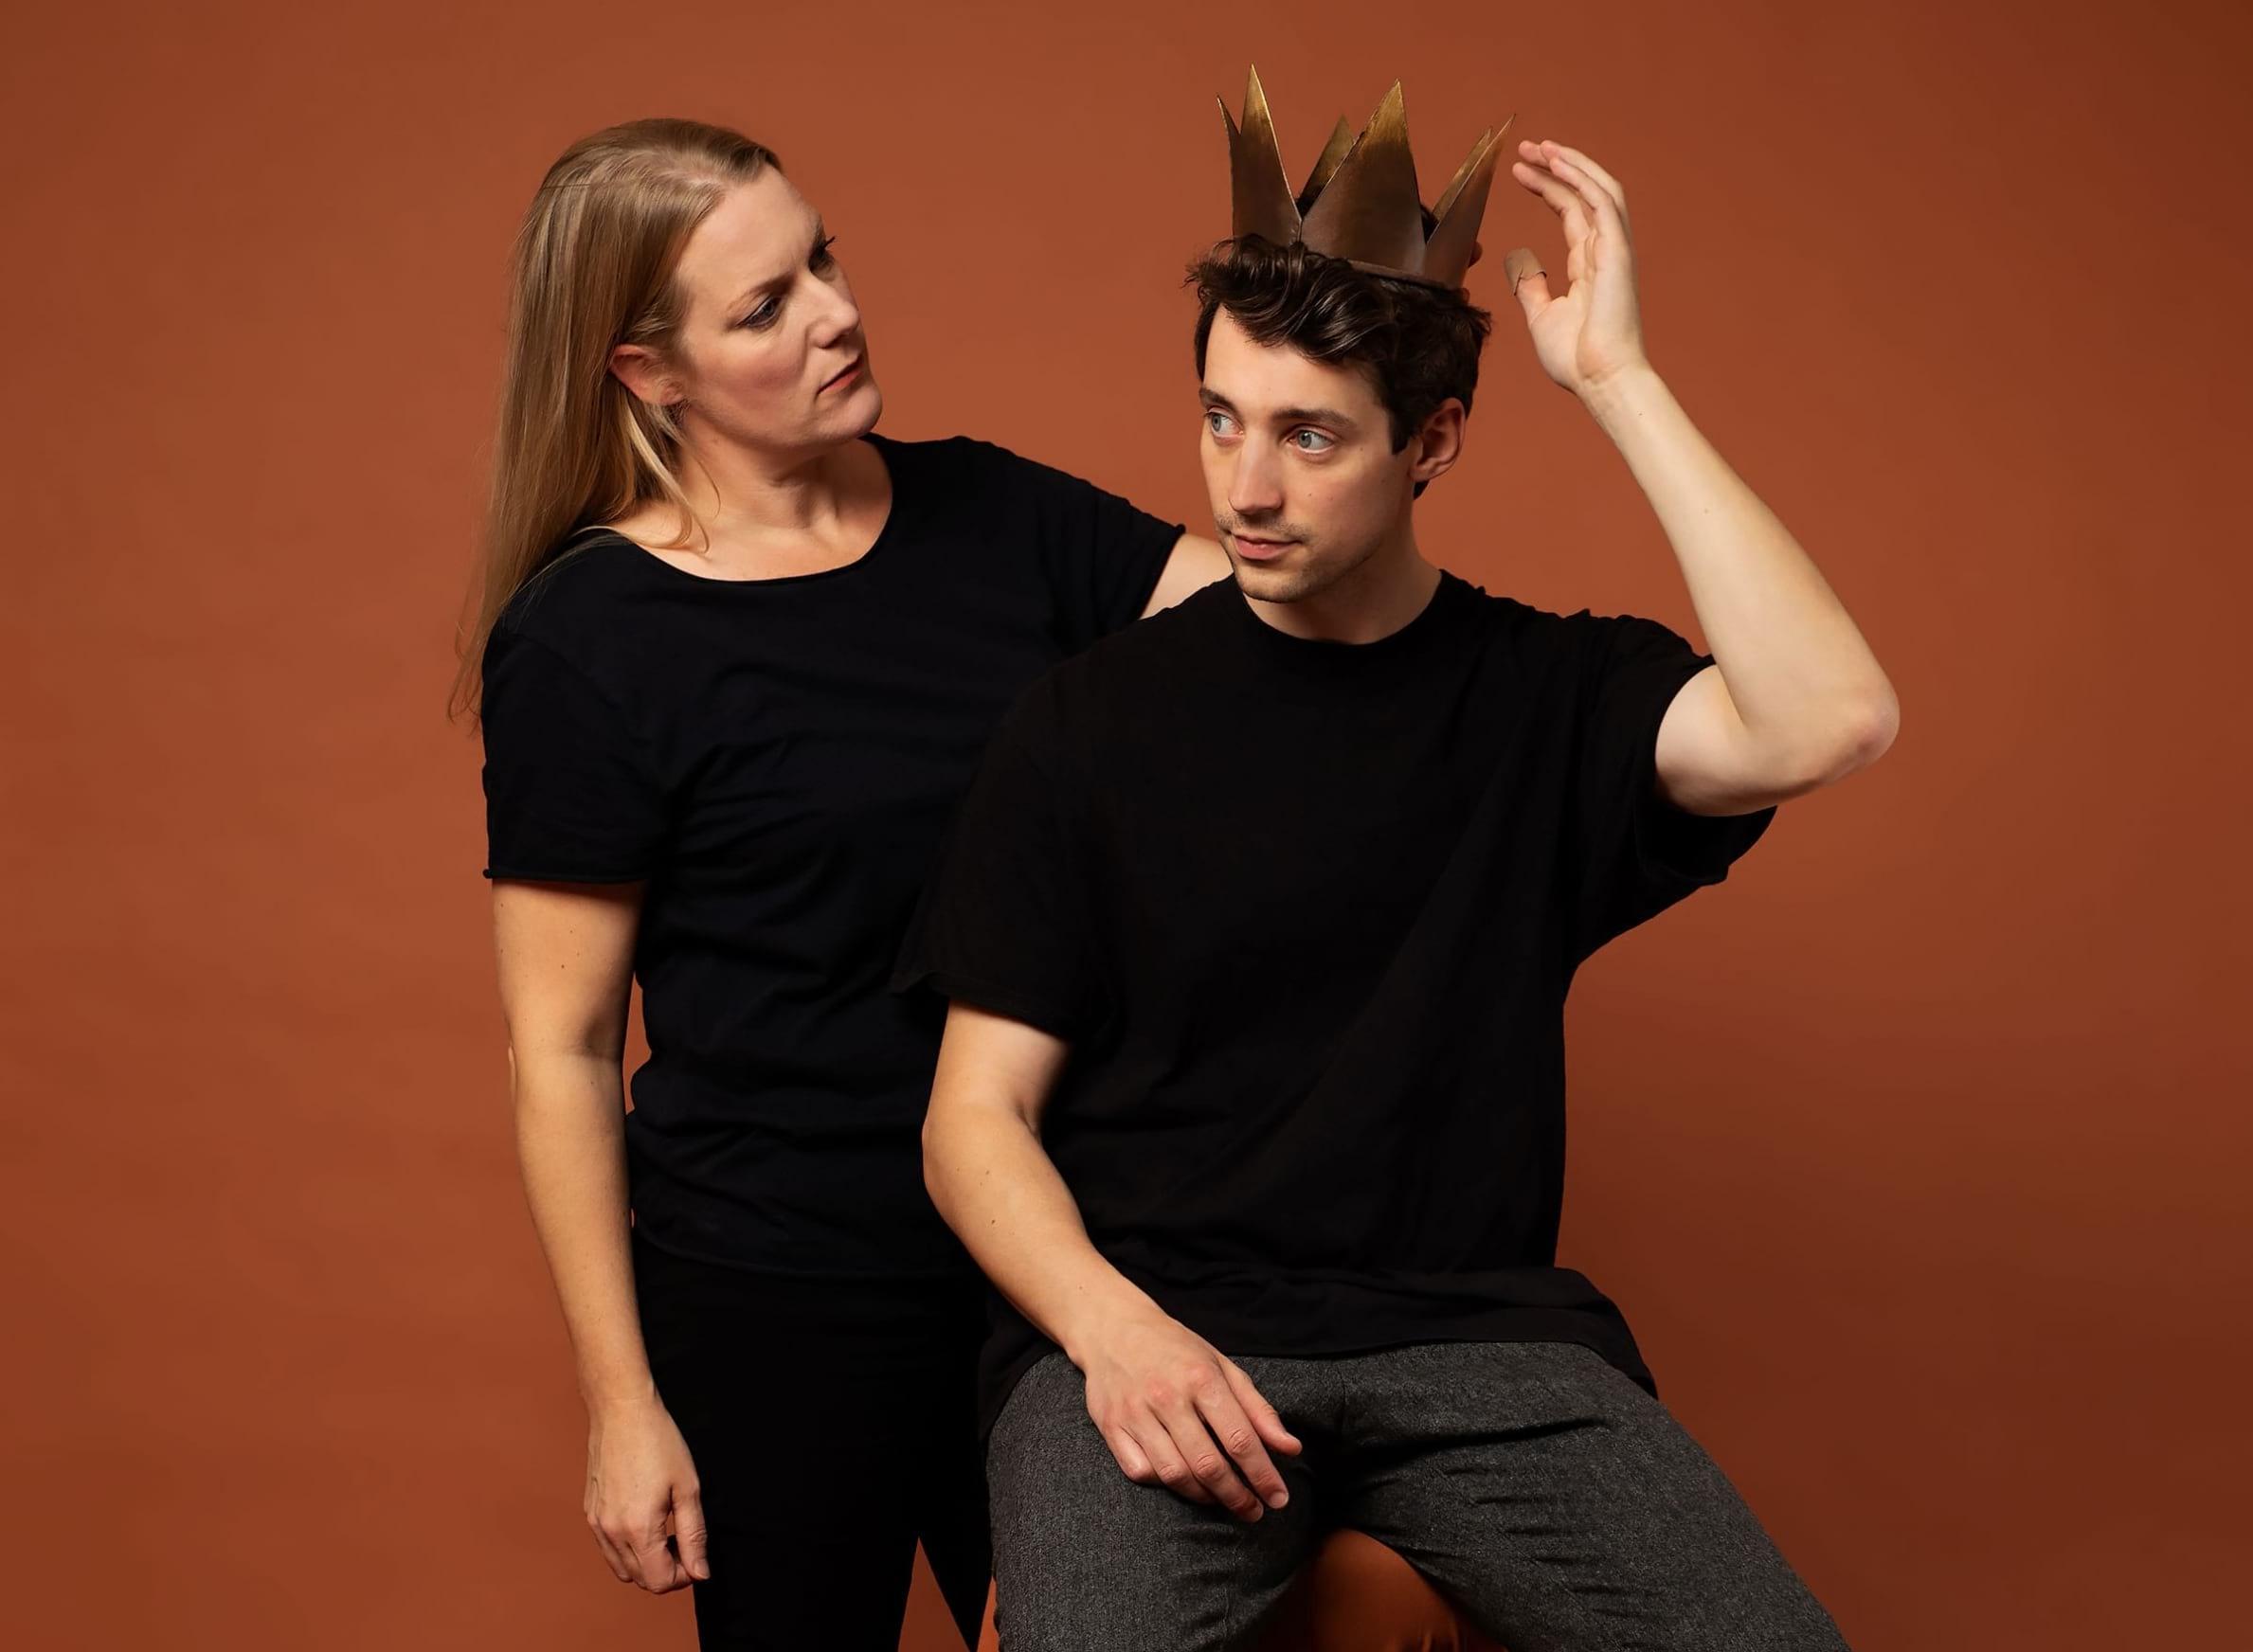 Sofia Jupither och Adam Lundgren. Foto: Ali Mian/Dramaten